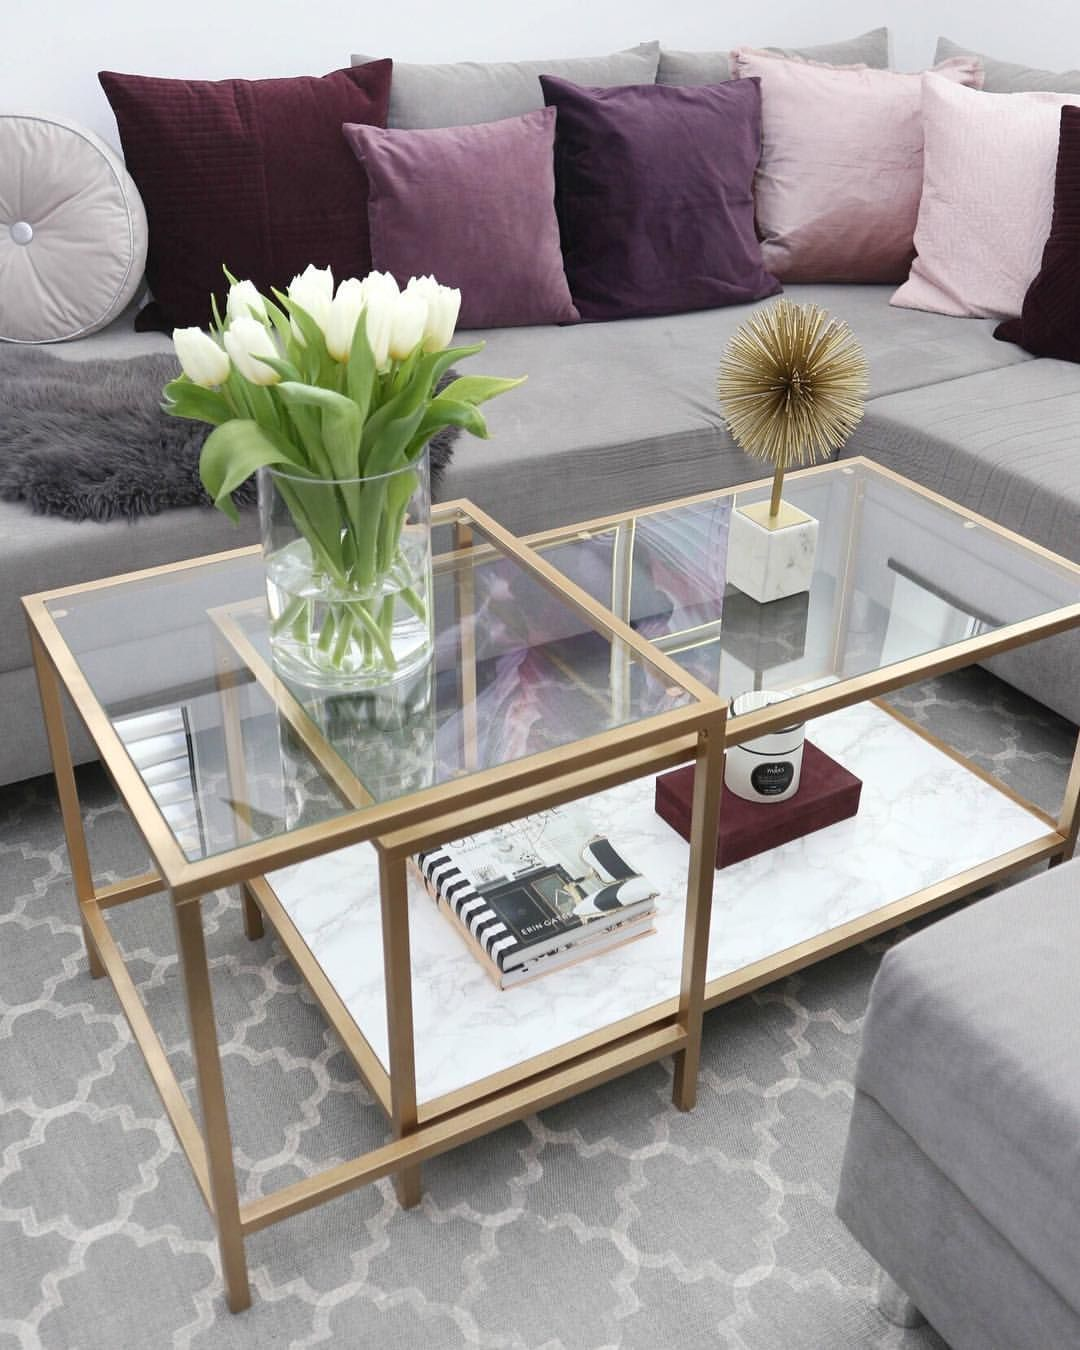 Wzwgpgsqtlkkxurathdrodttnwqjrjvlvsozfiqesmyrqwshdz Ikea Diy Coffee Table Home Decor [ 1350 x 1080 Pixel ]